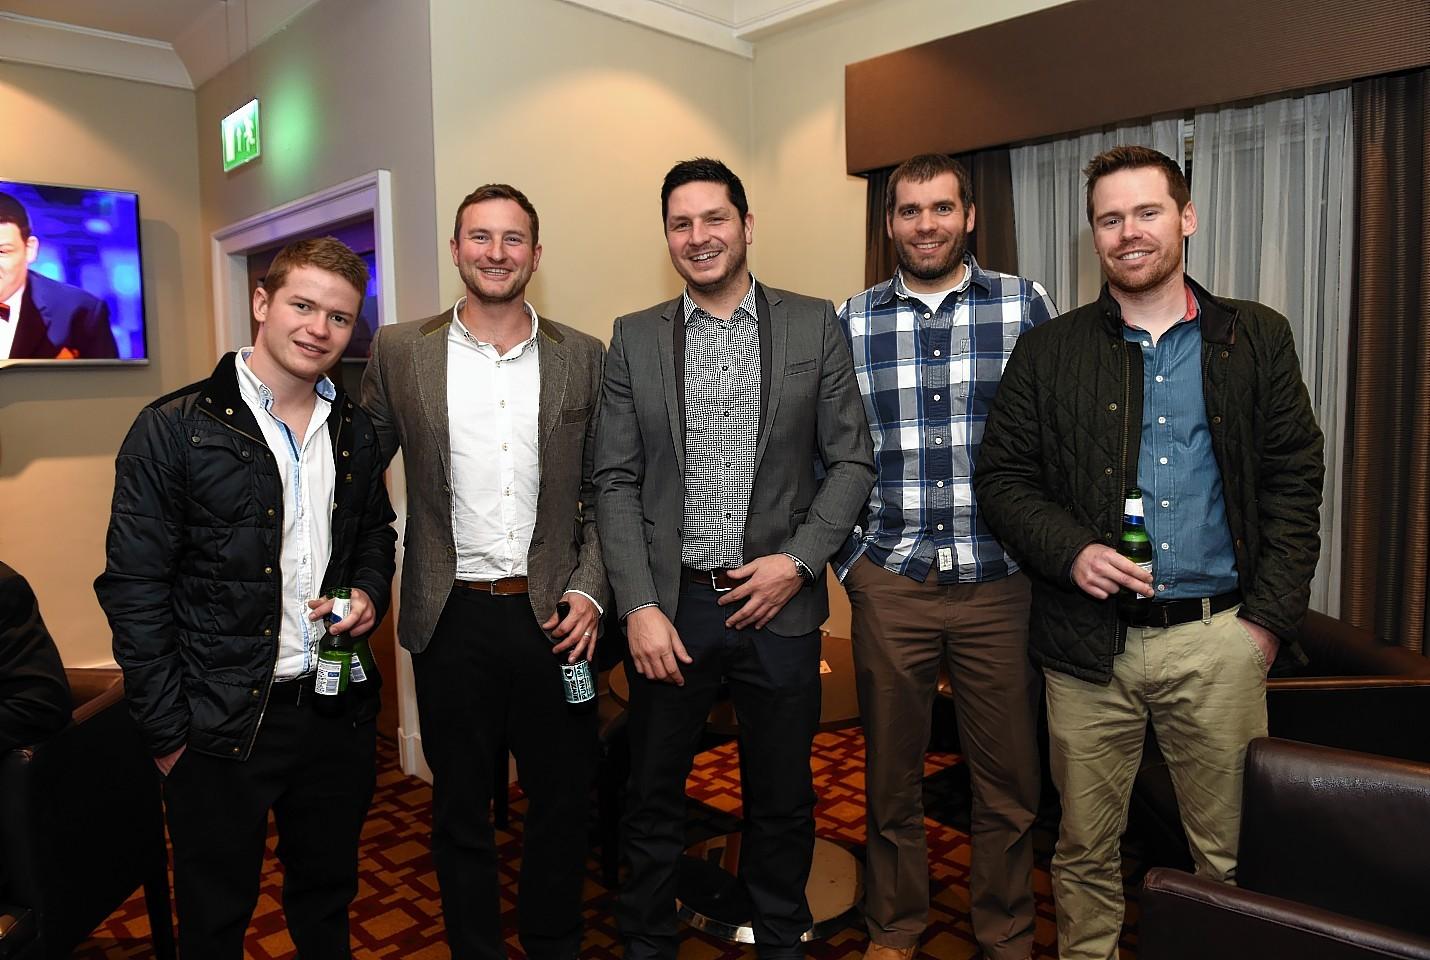 Jamie Corbett, Steve Bowman, Jamie Walker, Ross Maddox and Barry Corbett